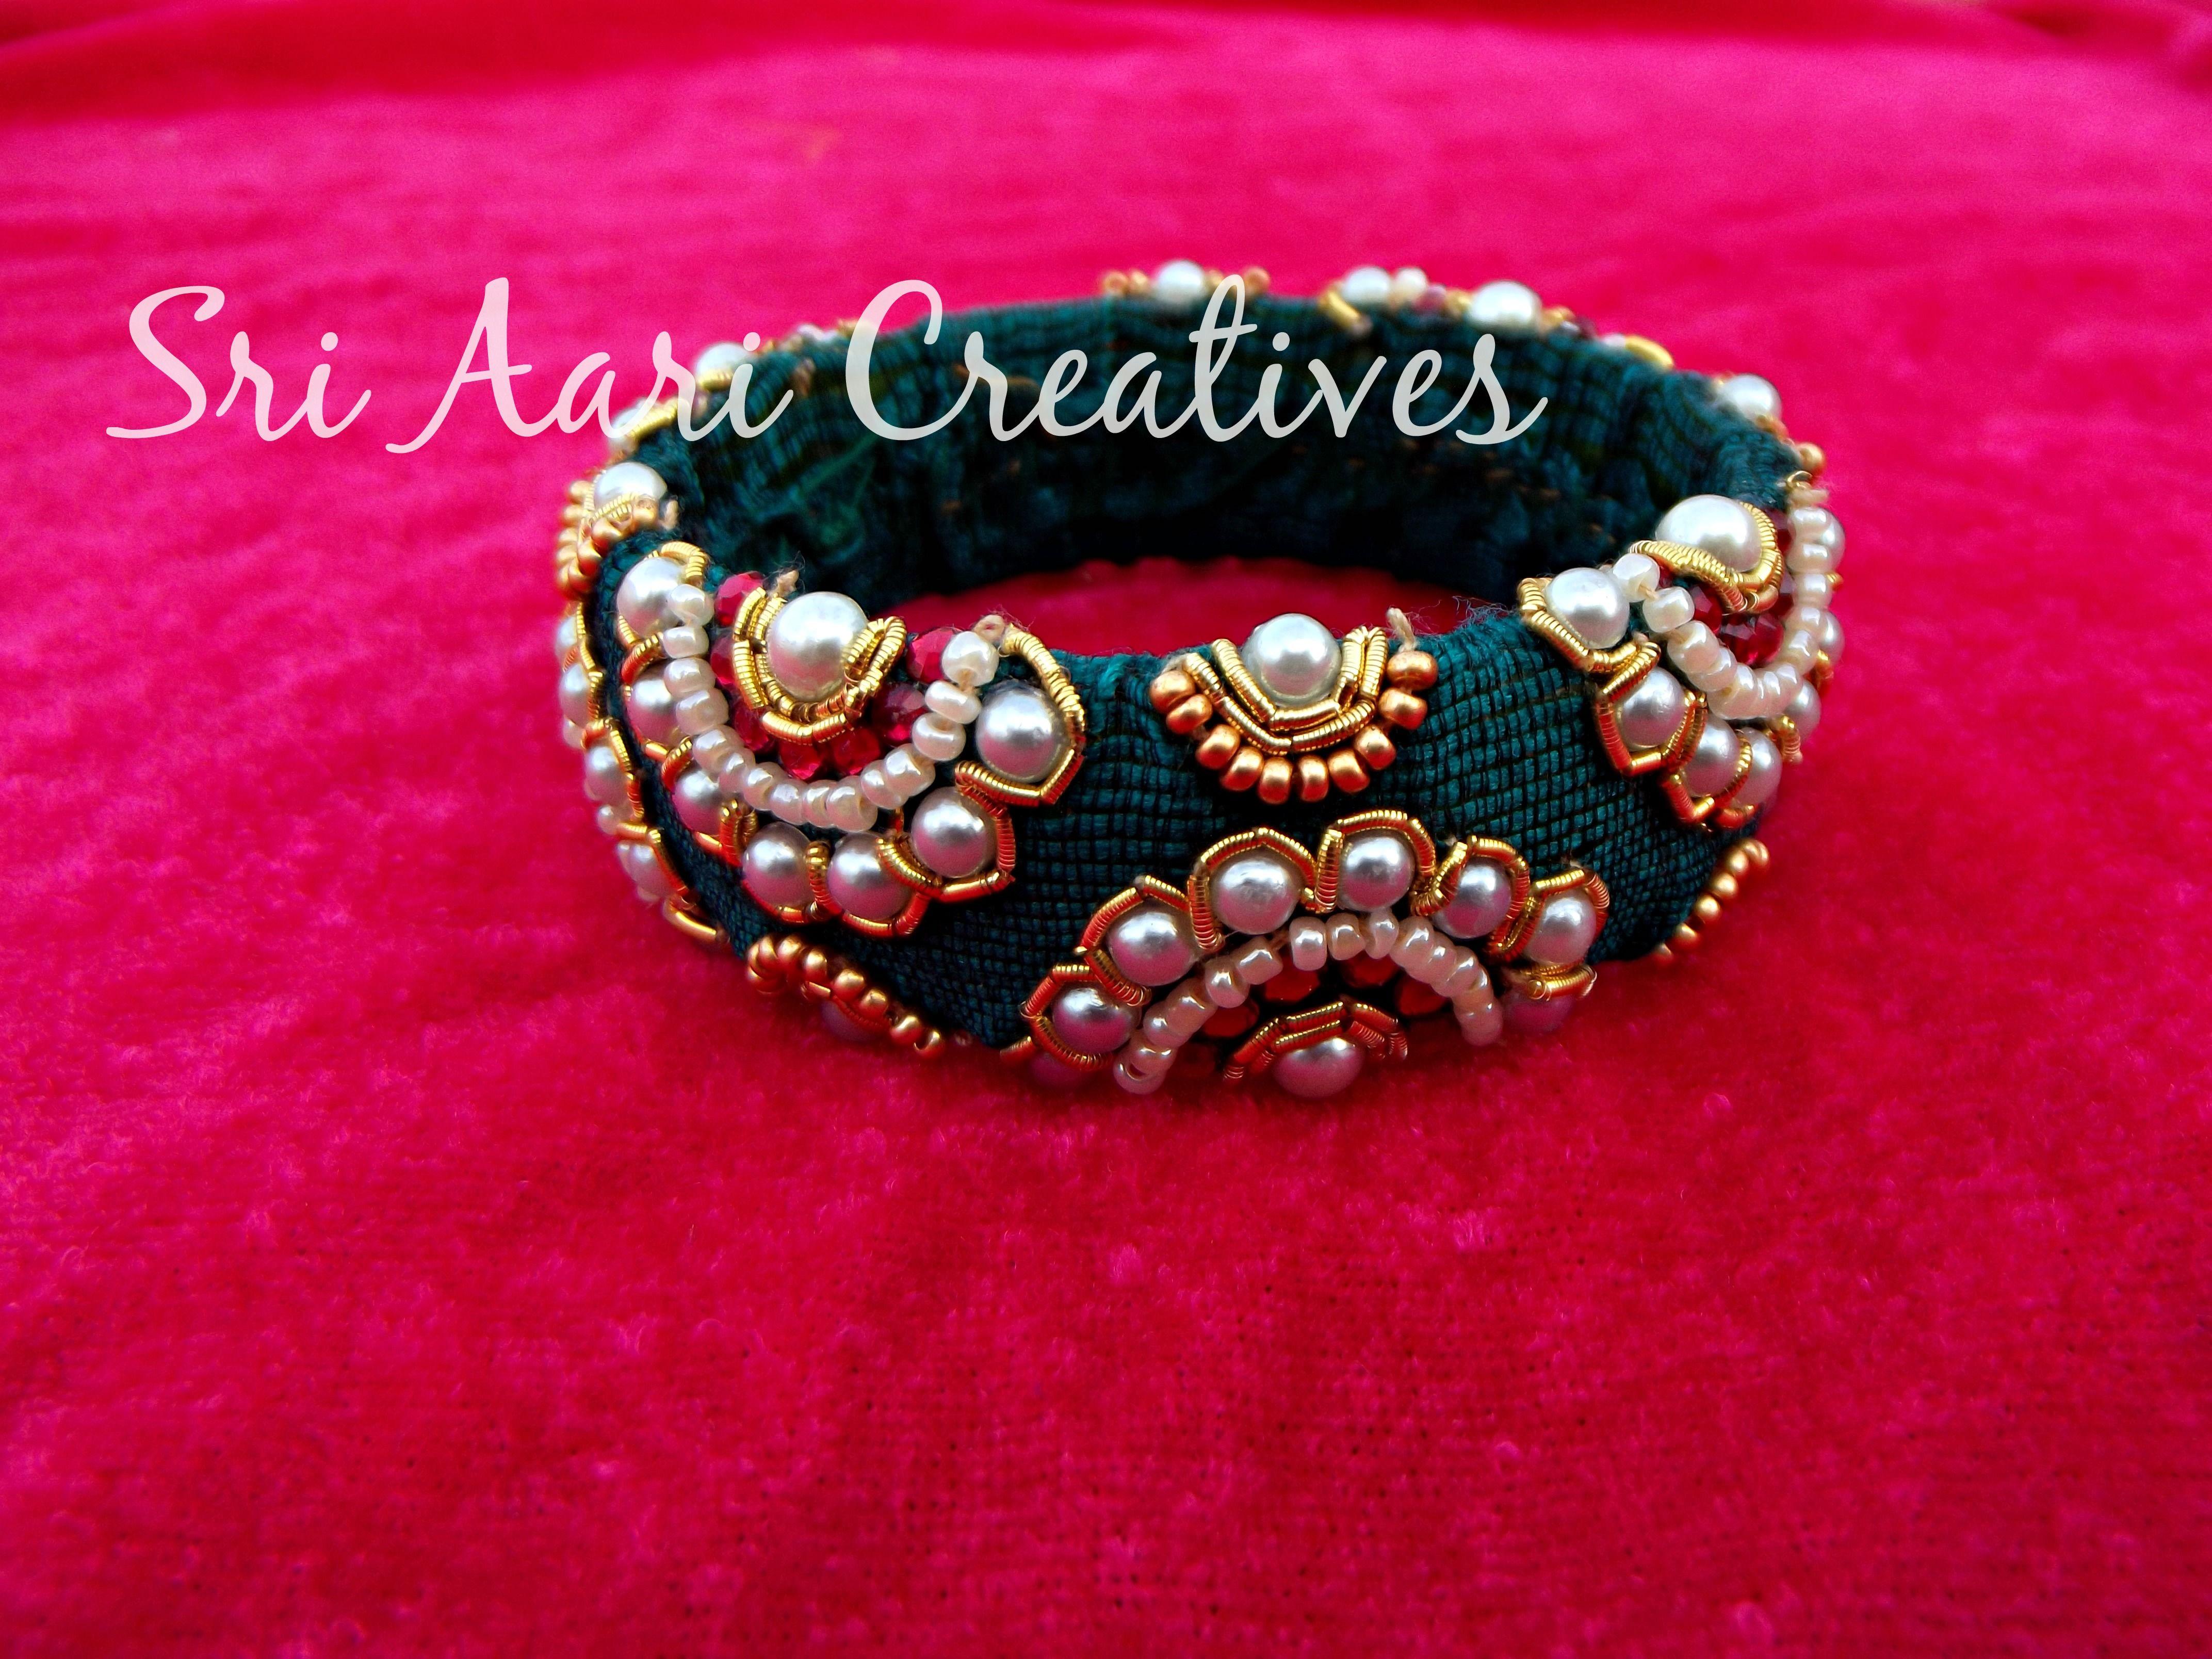 Pin by Shikhara K Reddy on Thread & Cloth Bangles | Pinterest ...